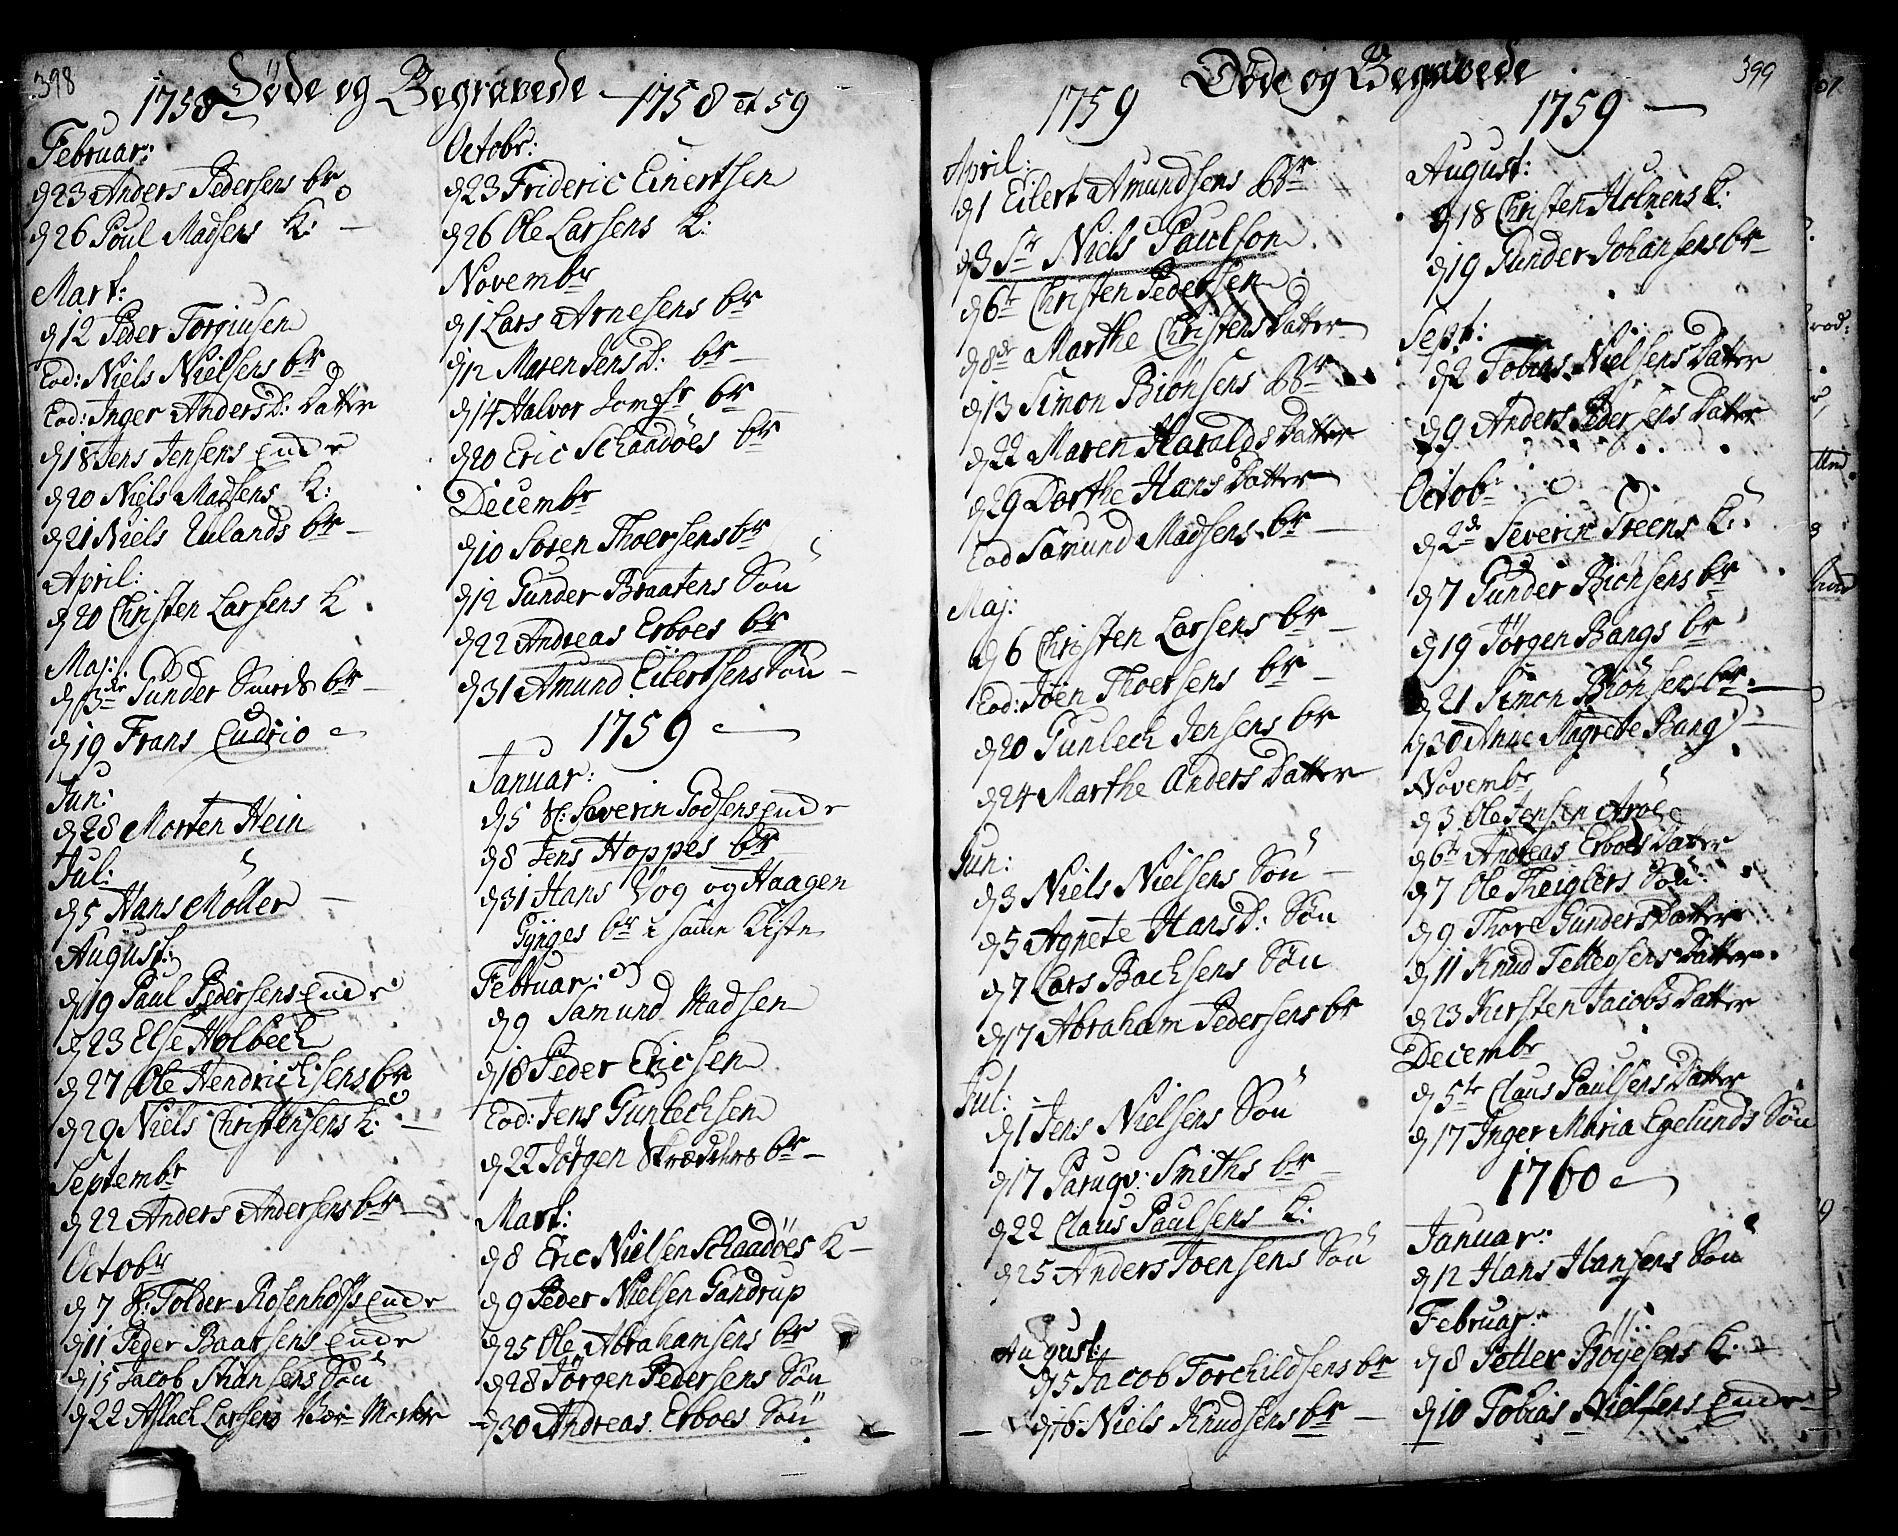 SAKO, Kragerø kirkebøker, F/Fa/L0001: Ministerialbok nr. 1, 1702-1766, s. 398-399